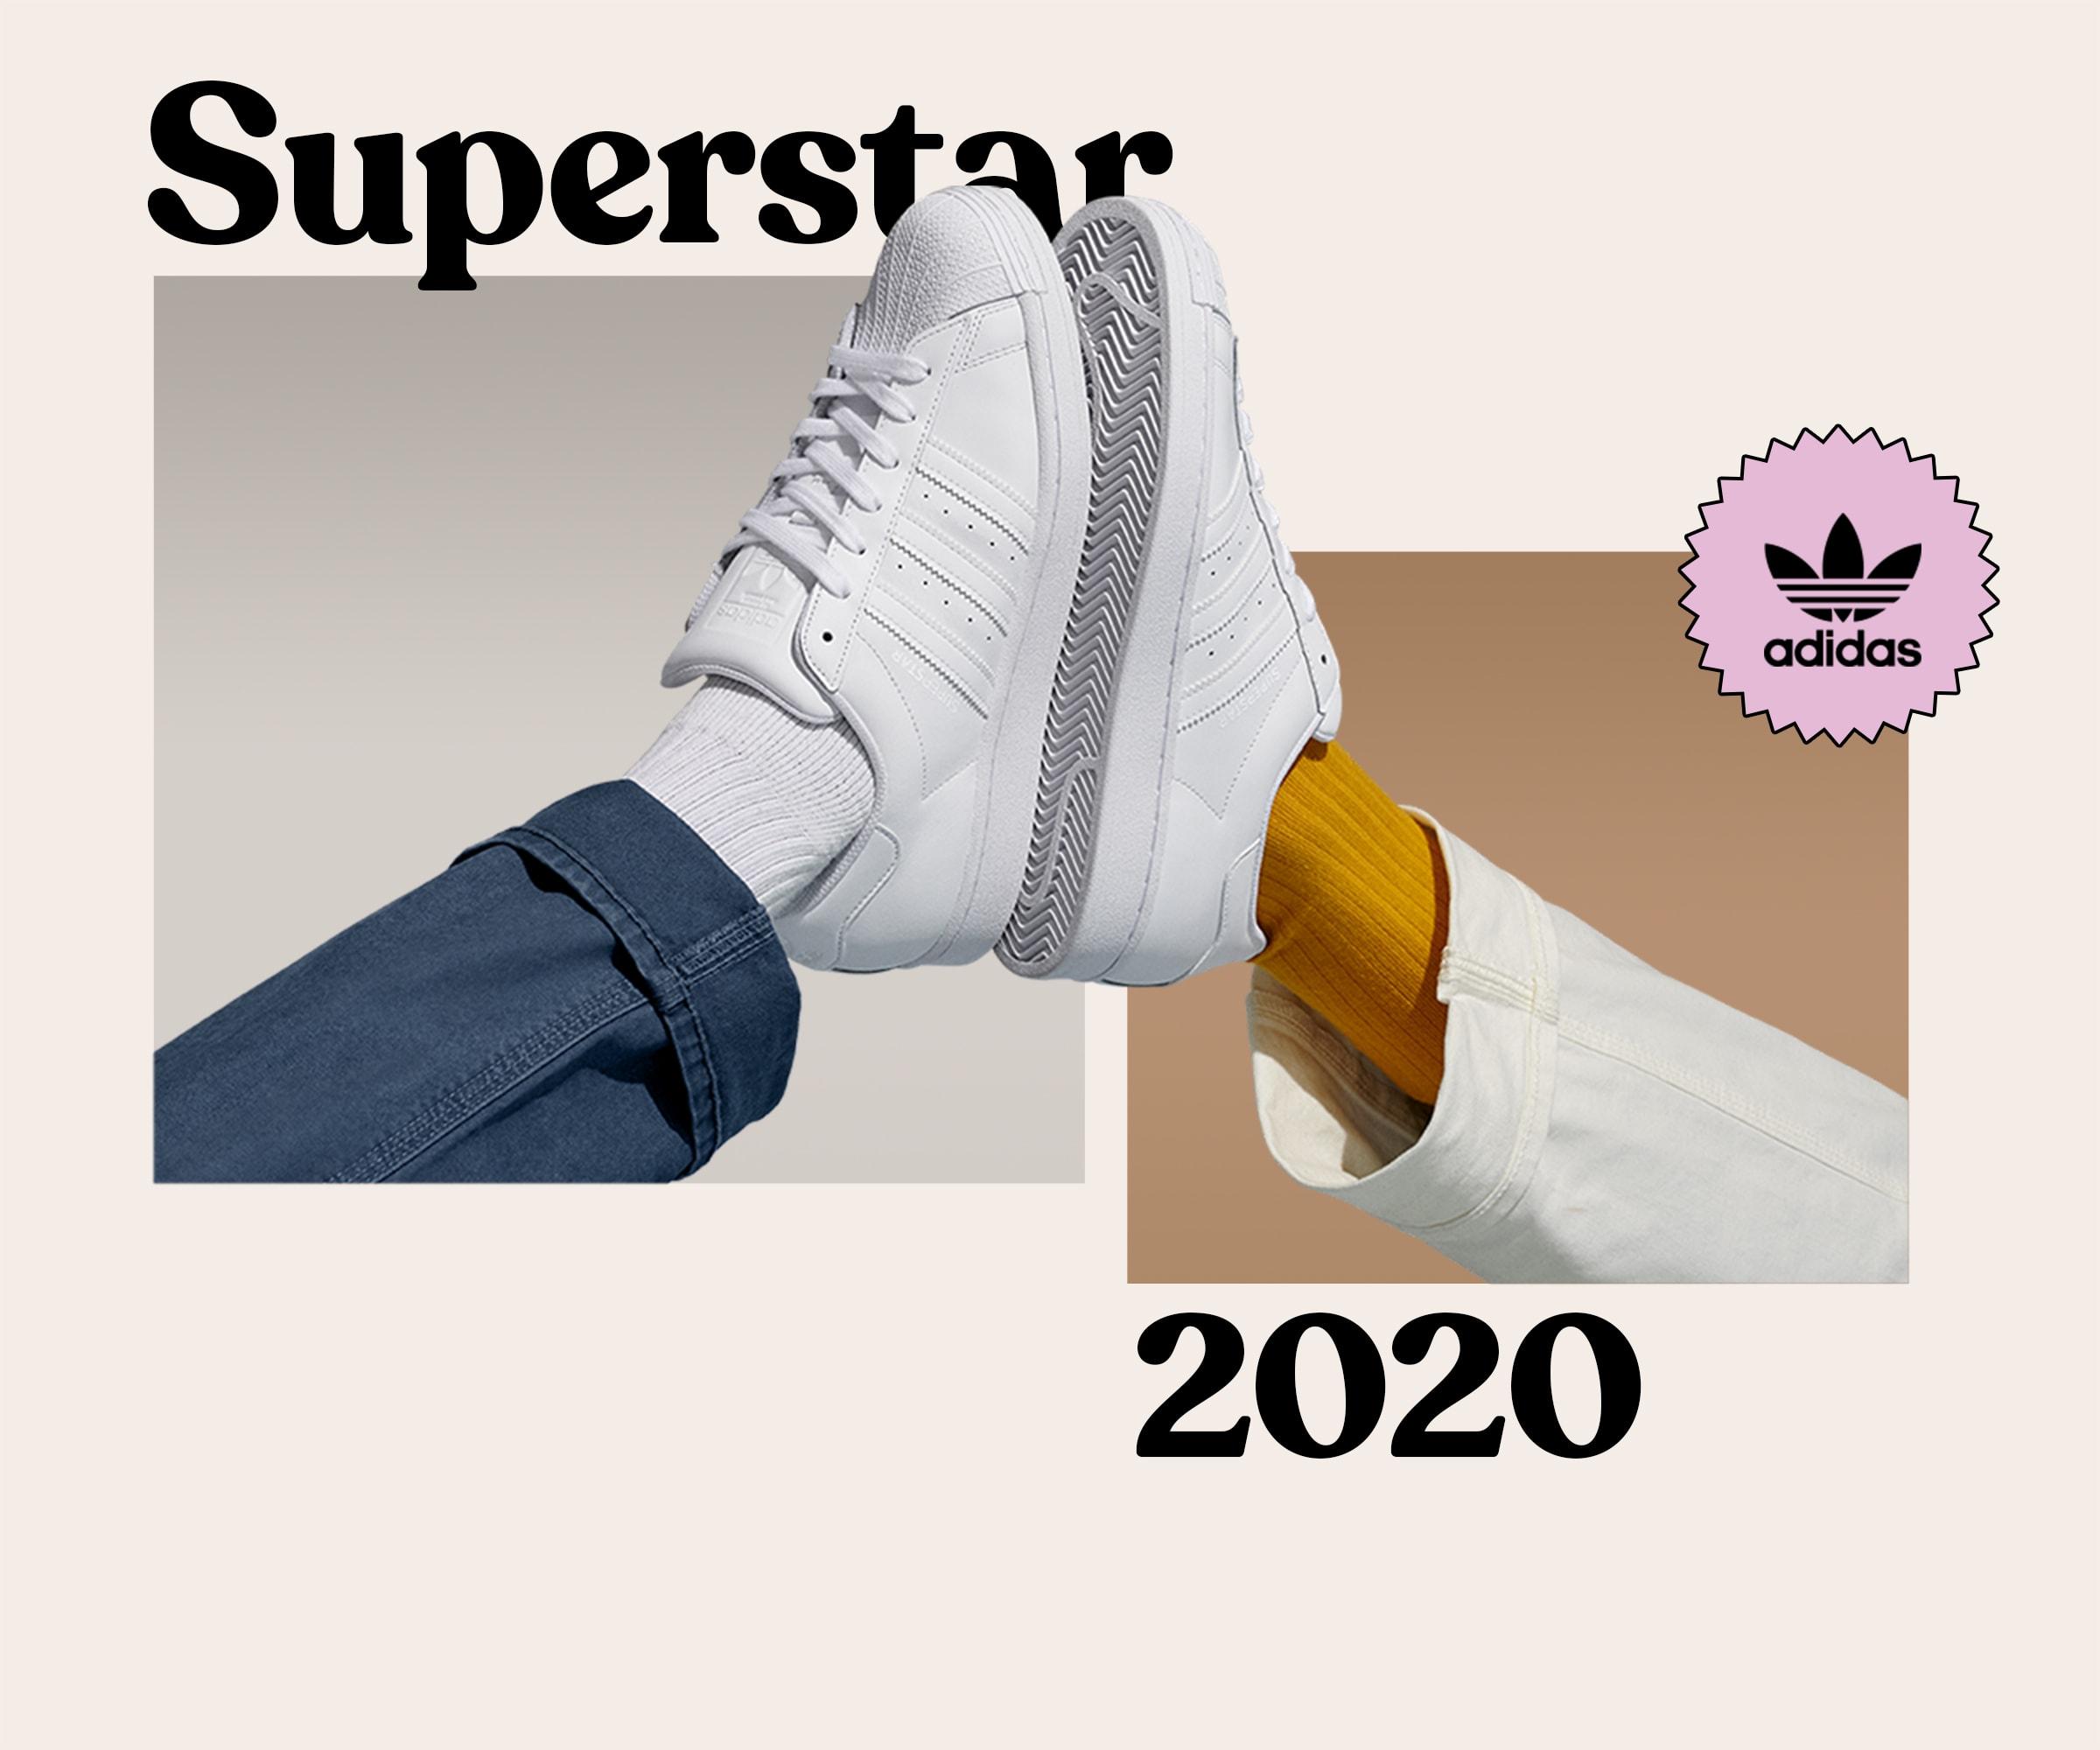 adidas donna superstar 2020